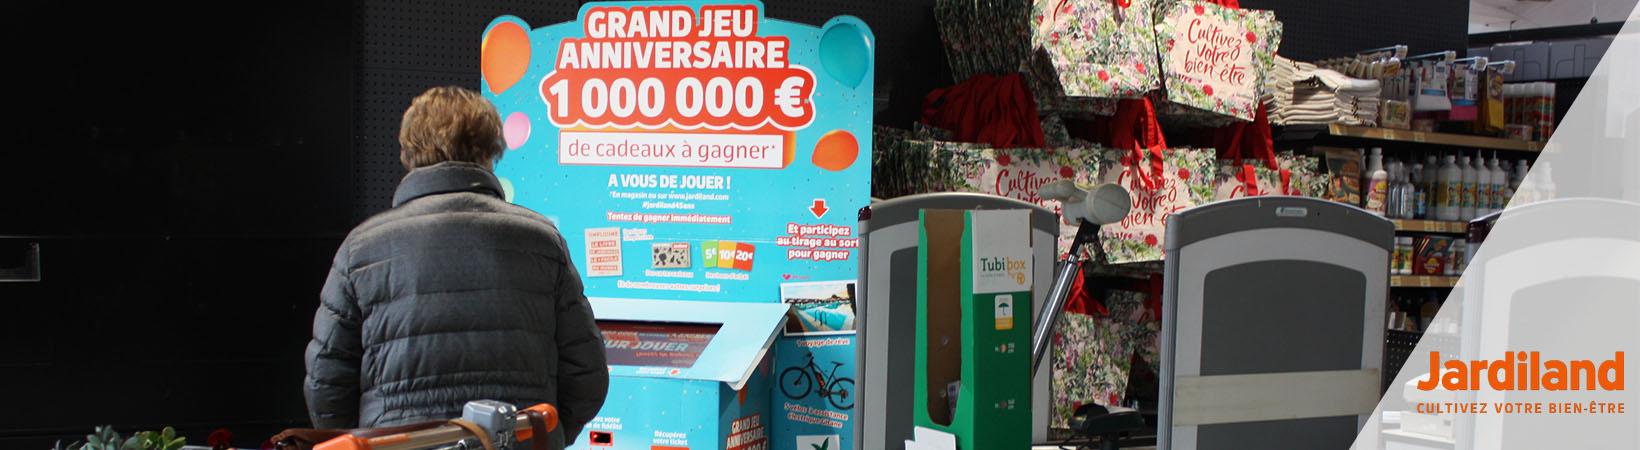 jardiland-table-de-jeu-borne-interactive-arsenal-anniversaire